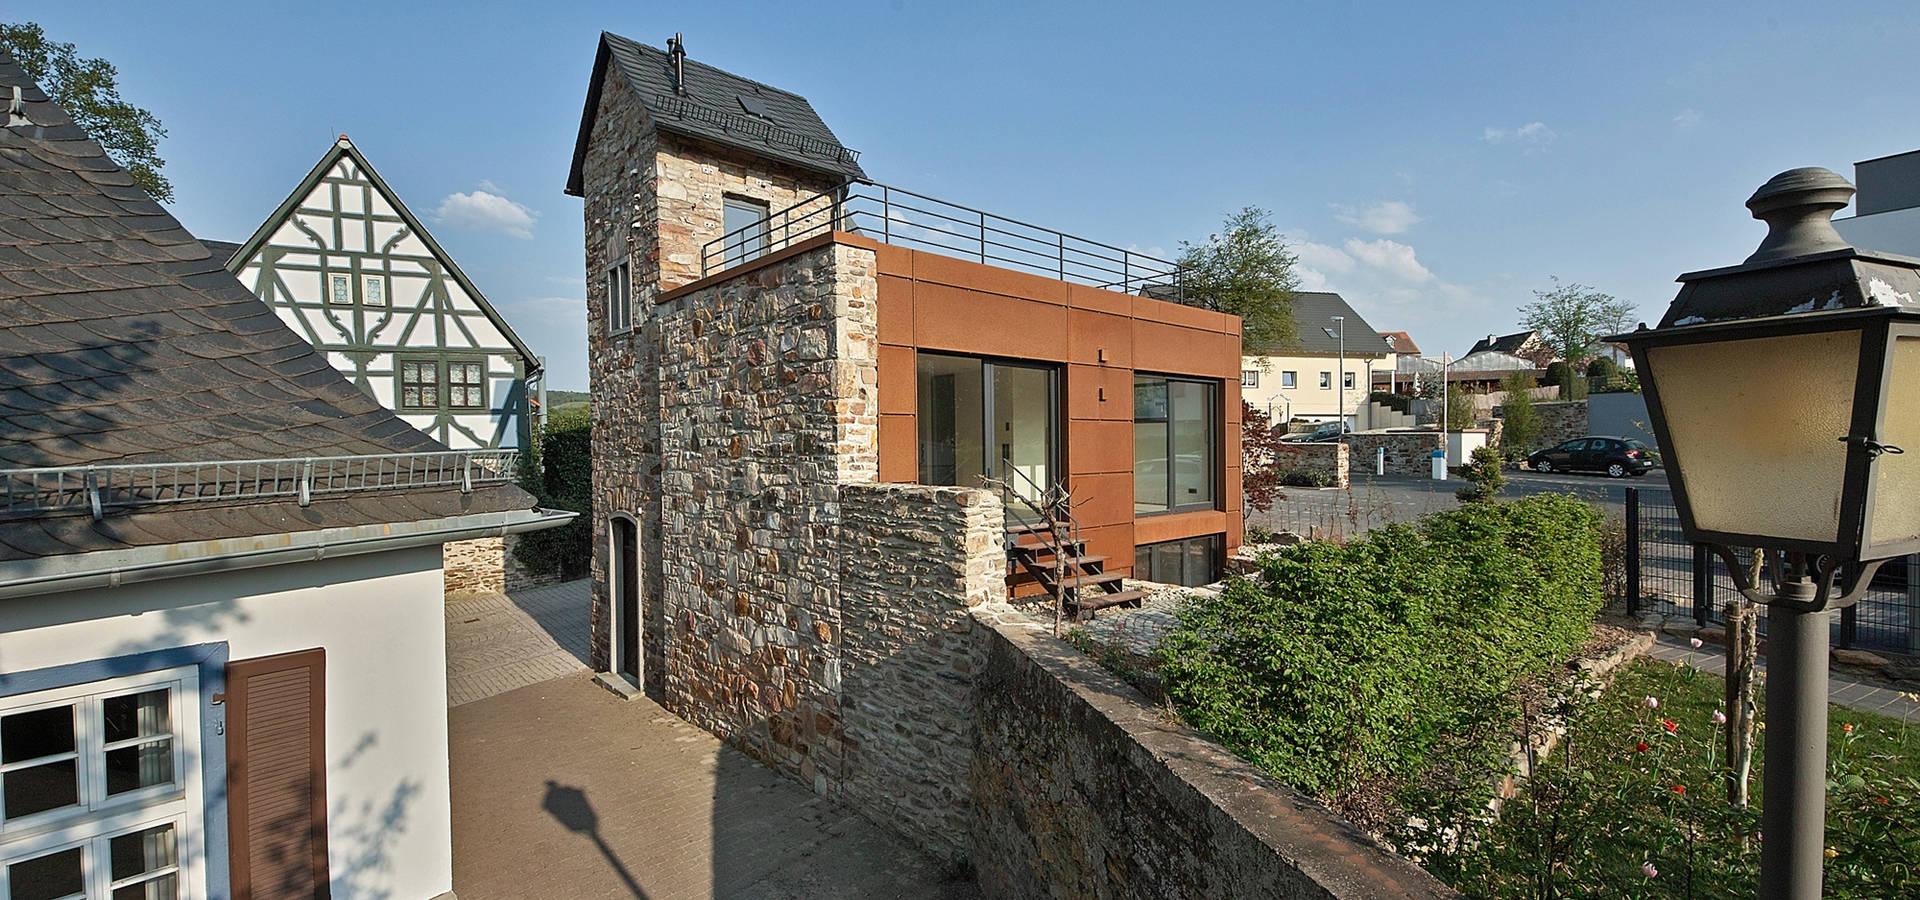 GUCKES & PARTNER Architekten mbB